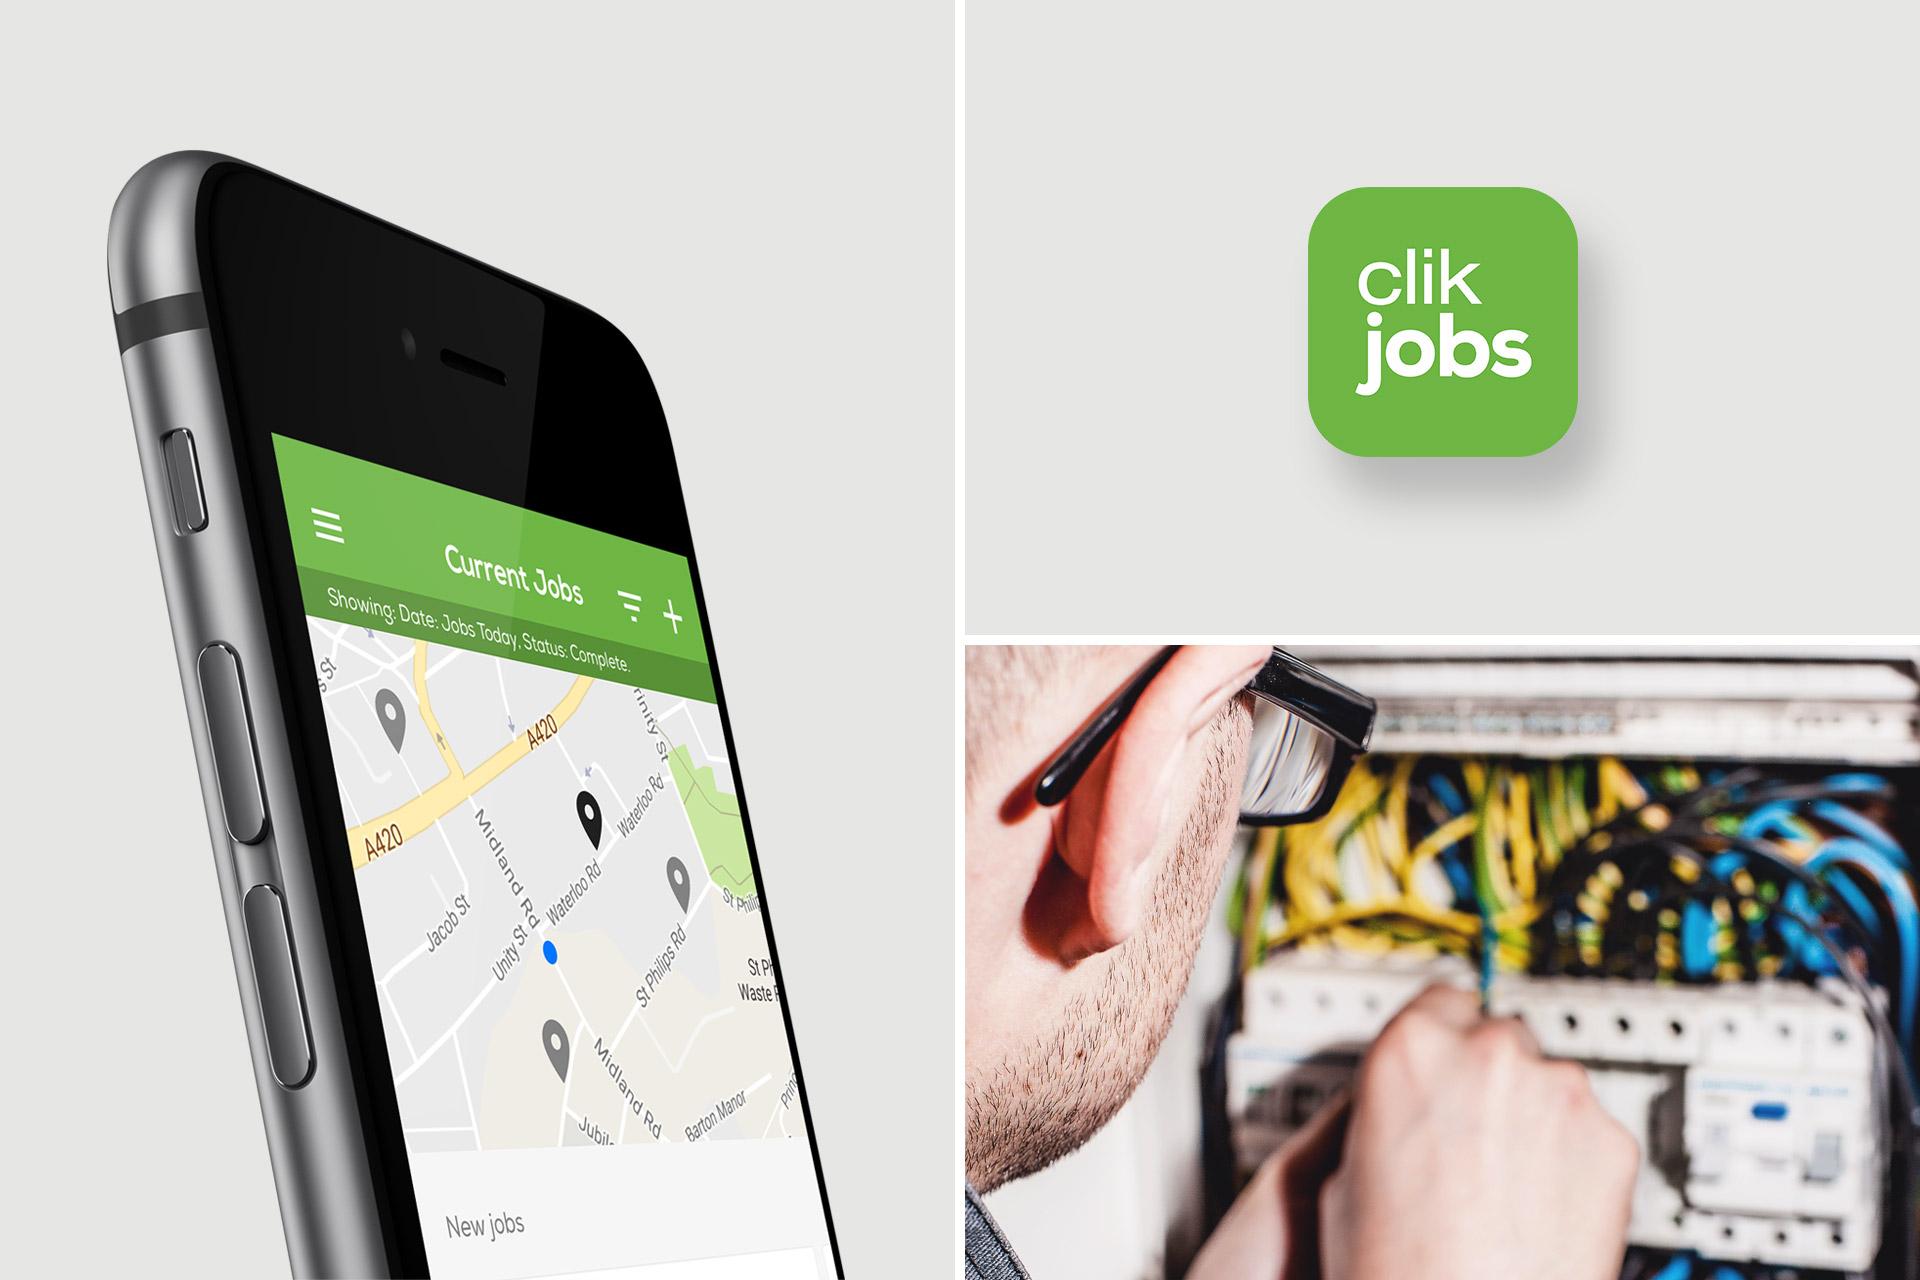 Mobile UI Designs for Clik Jobs App